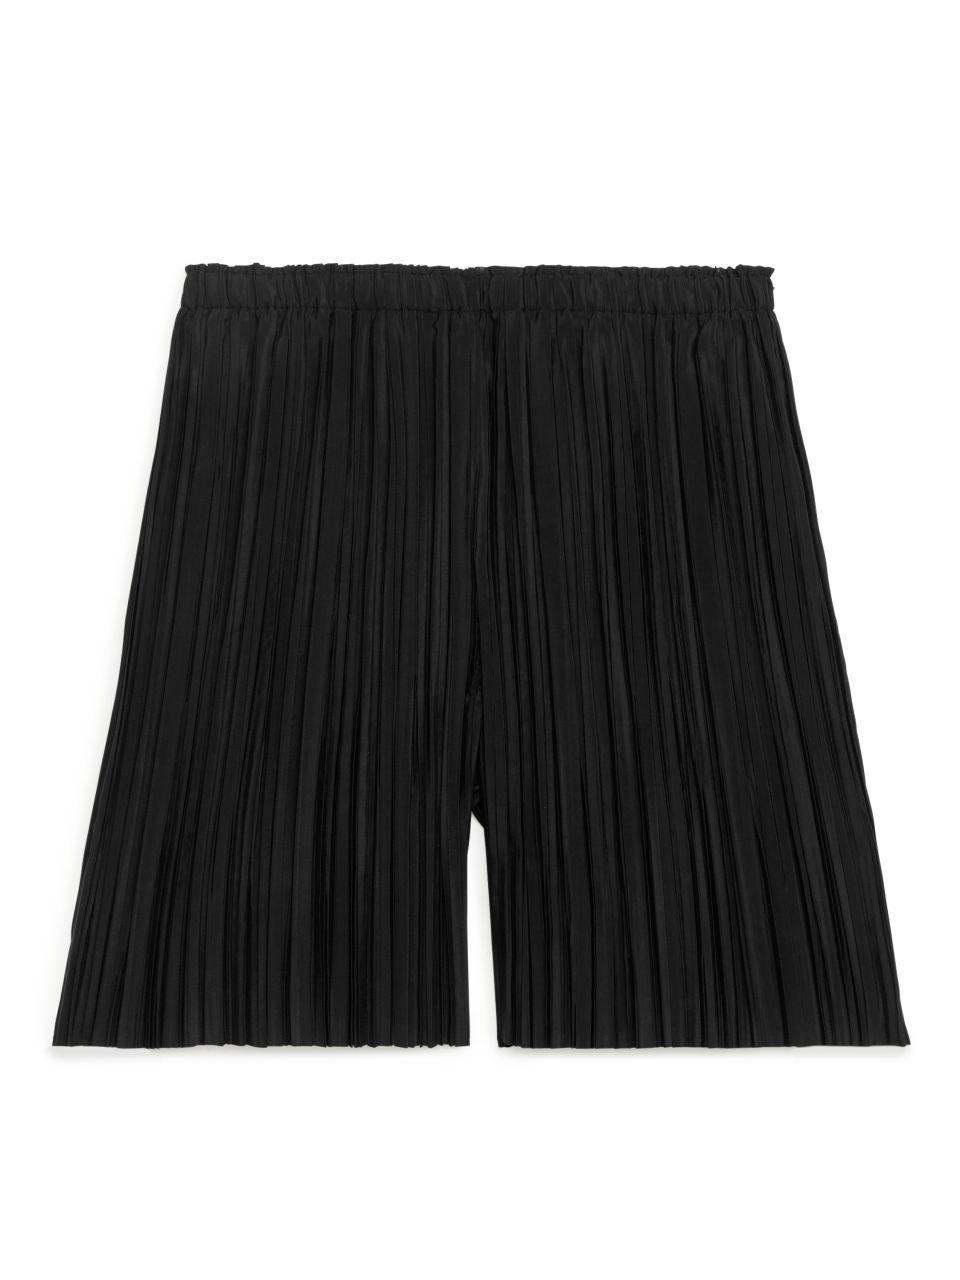 Pleated Shorts - Black